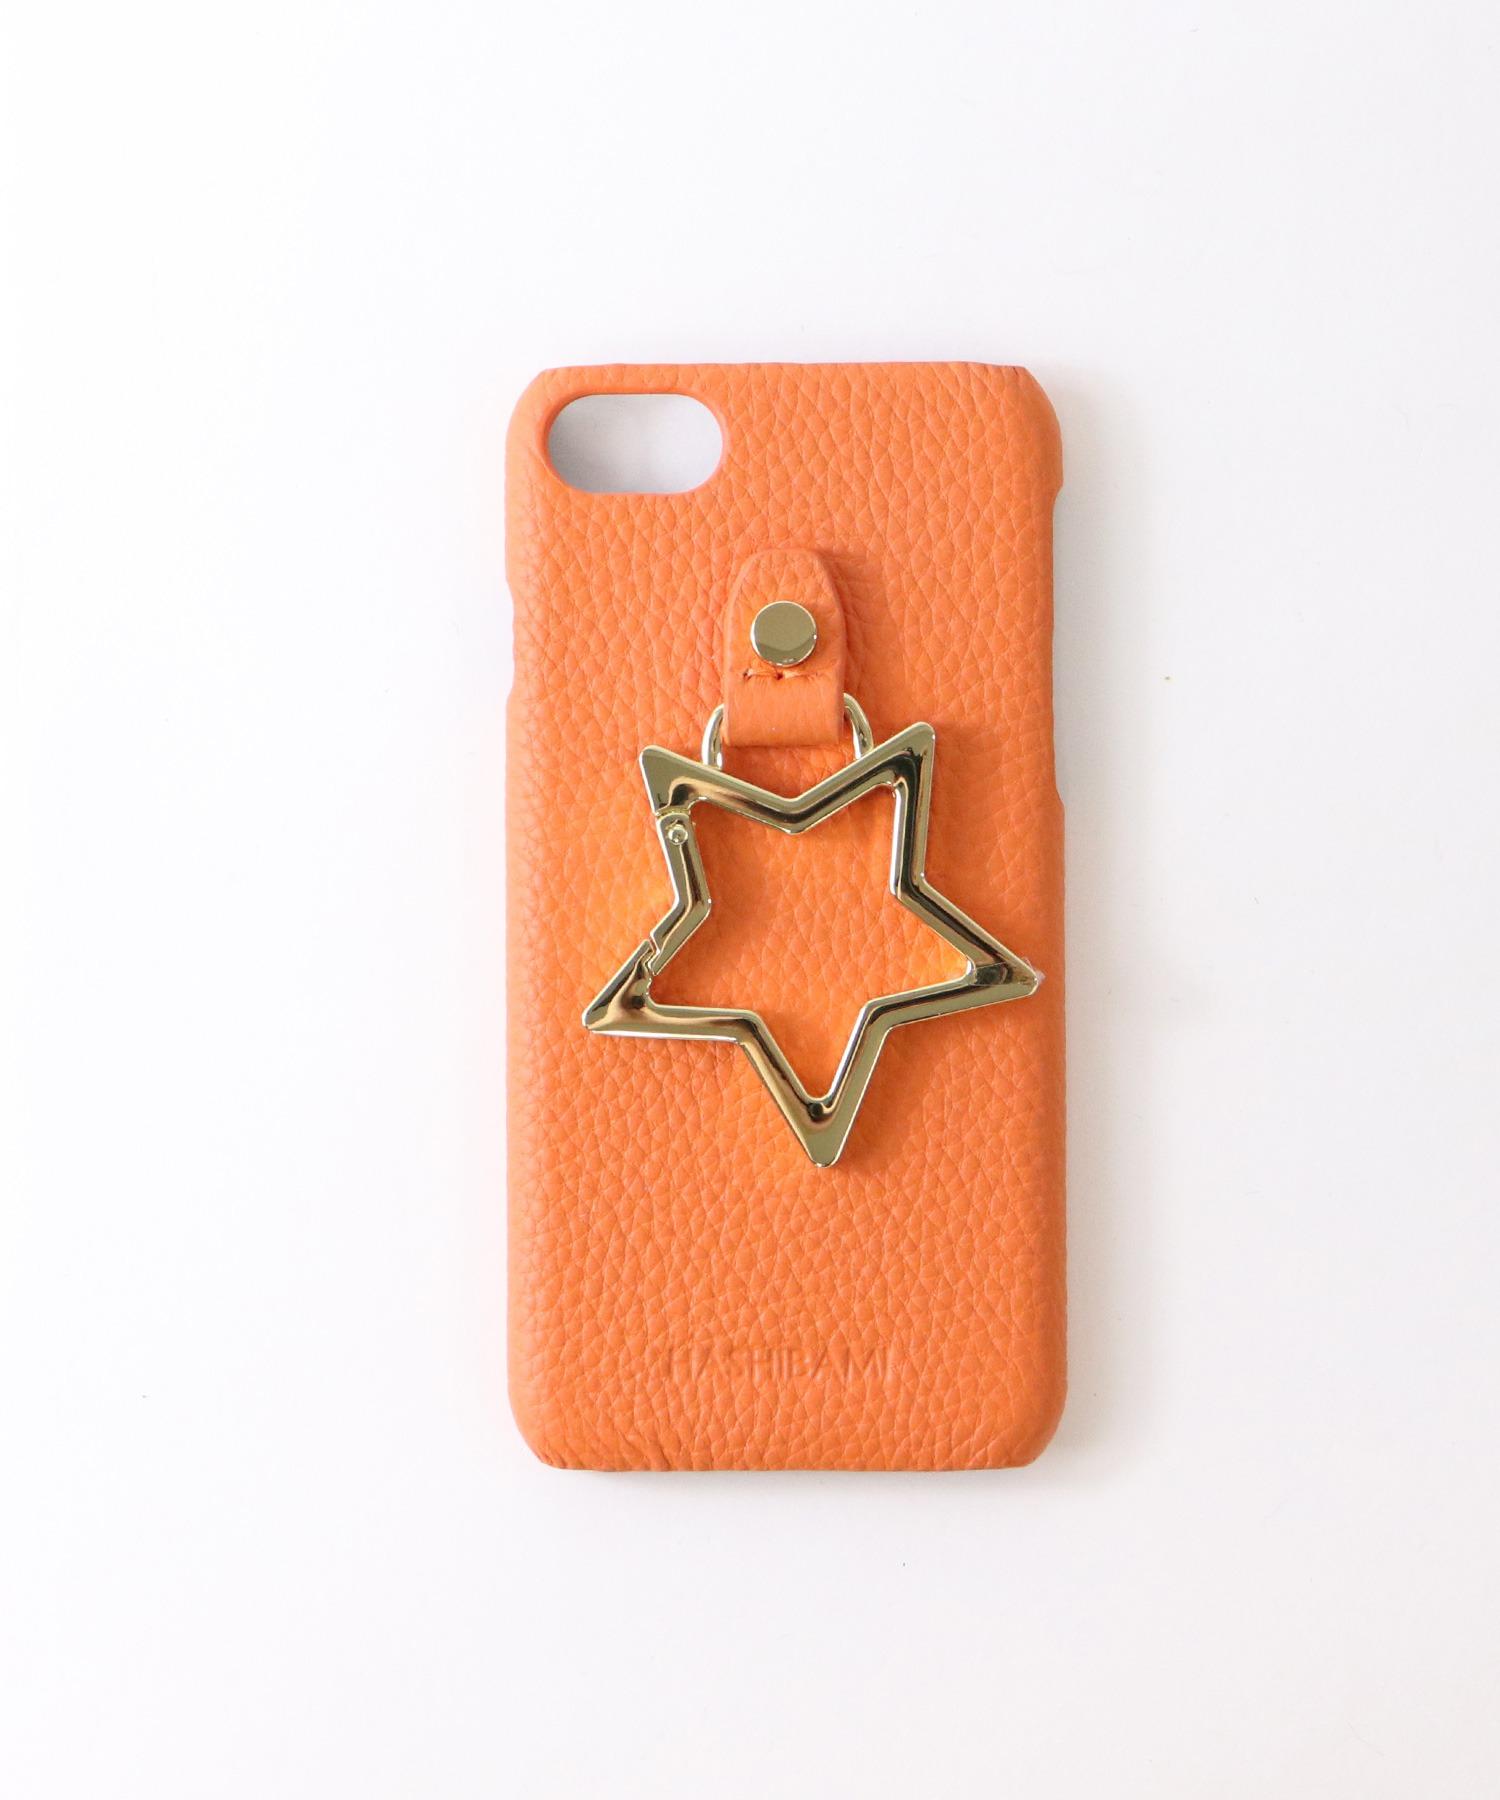 【 Hashibami / ハシバミ 】 # iPhone 8/7/6/6s/SE(第2世代) カバー リング付きケース